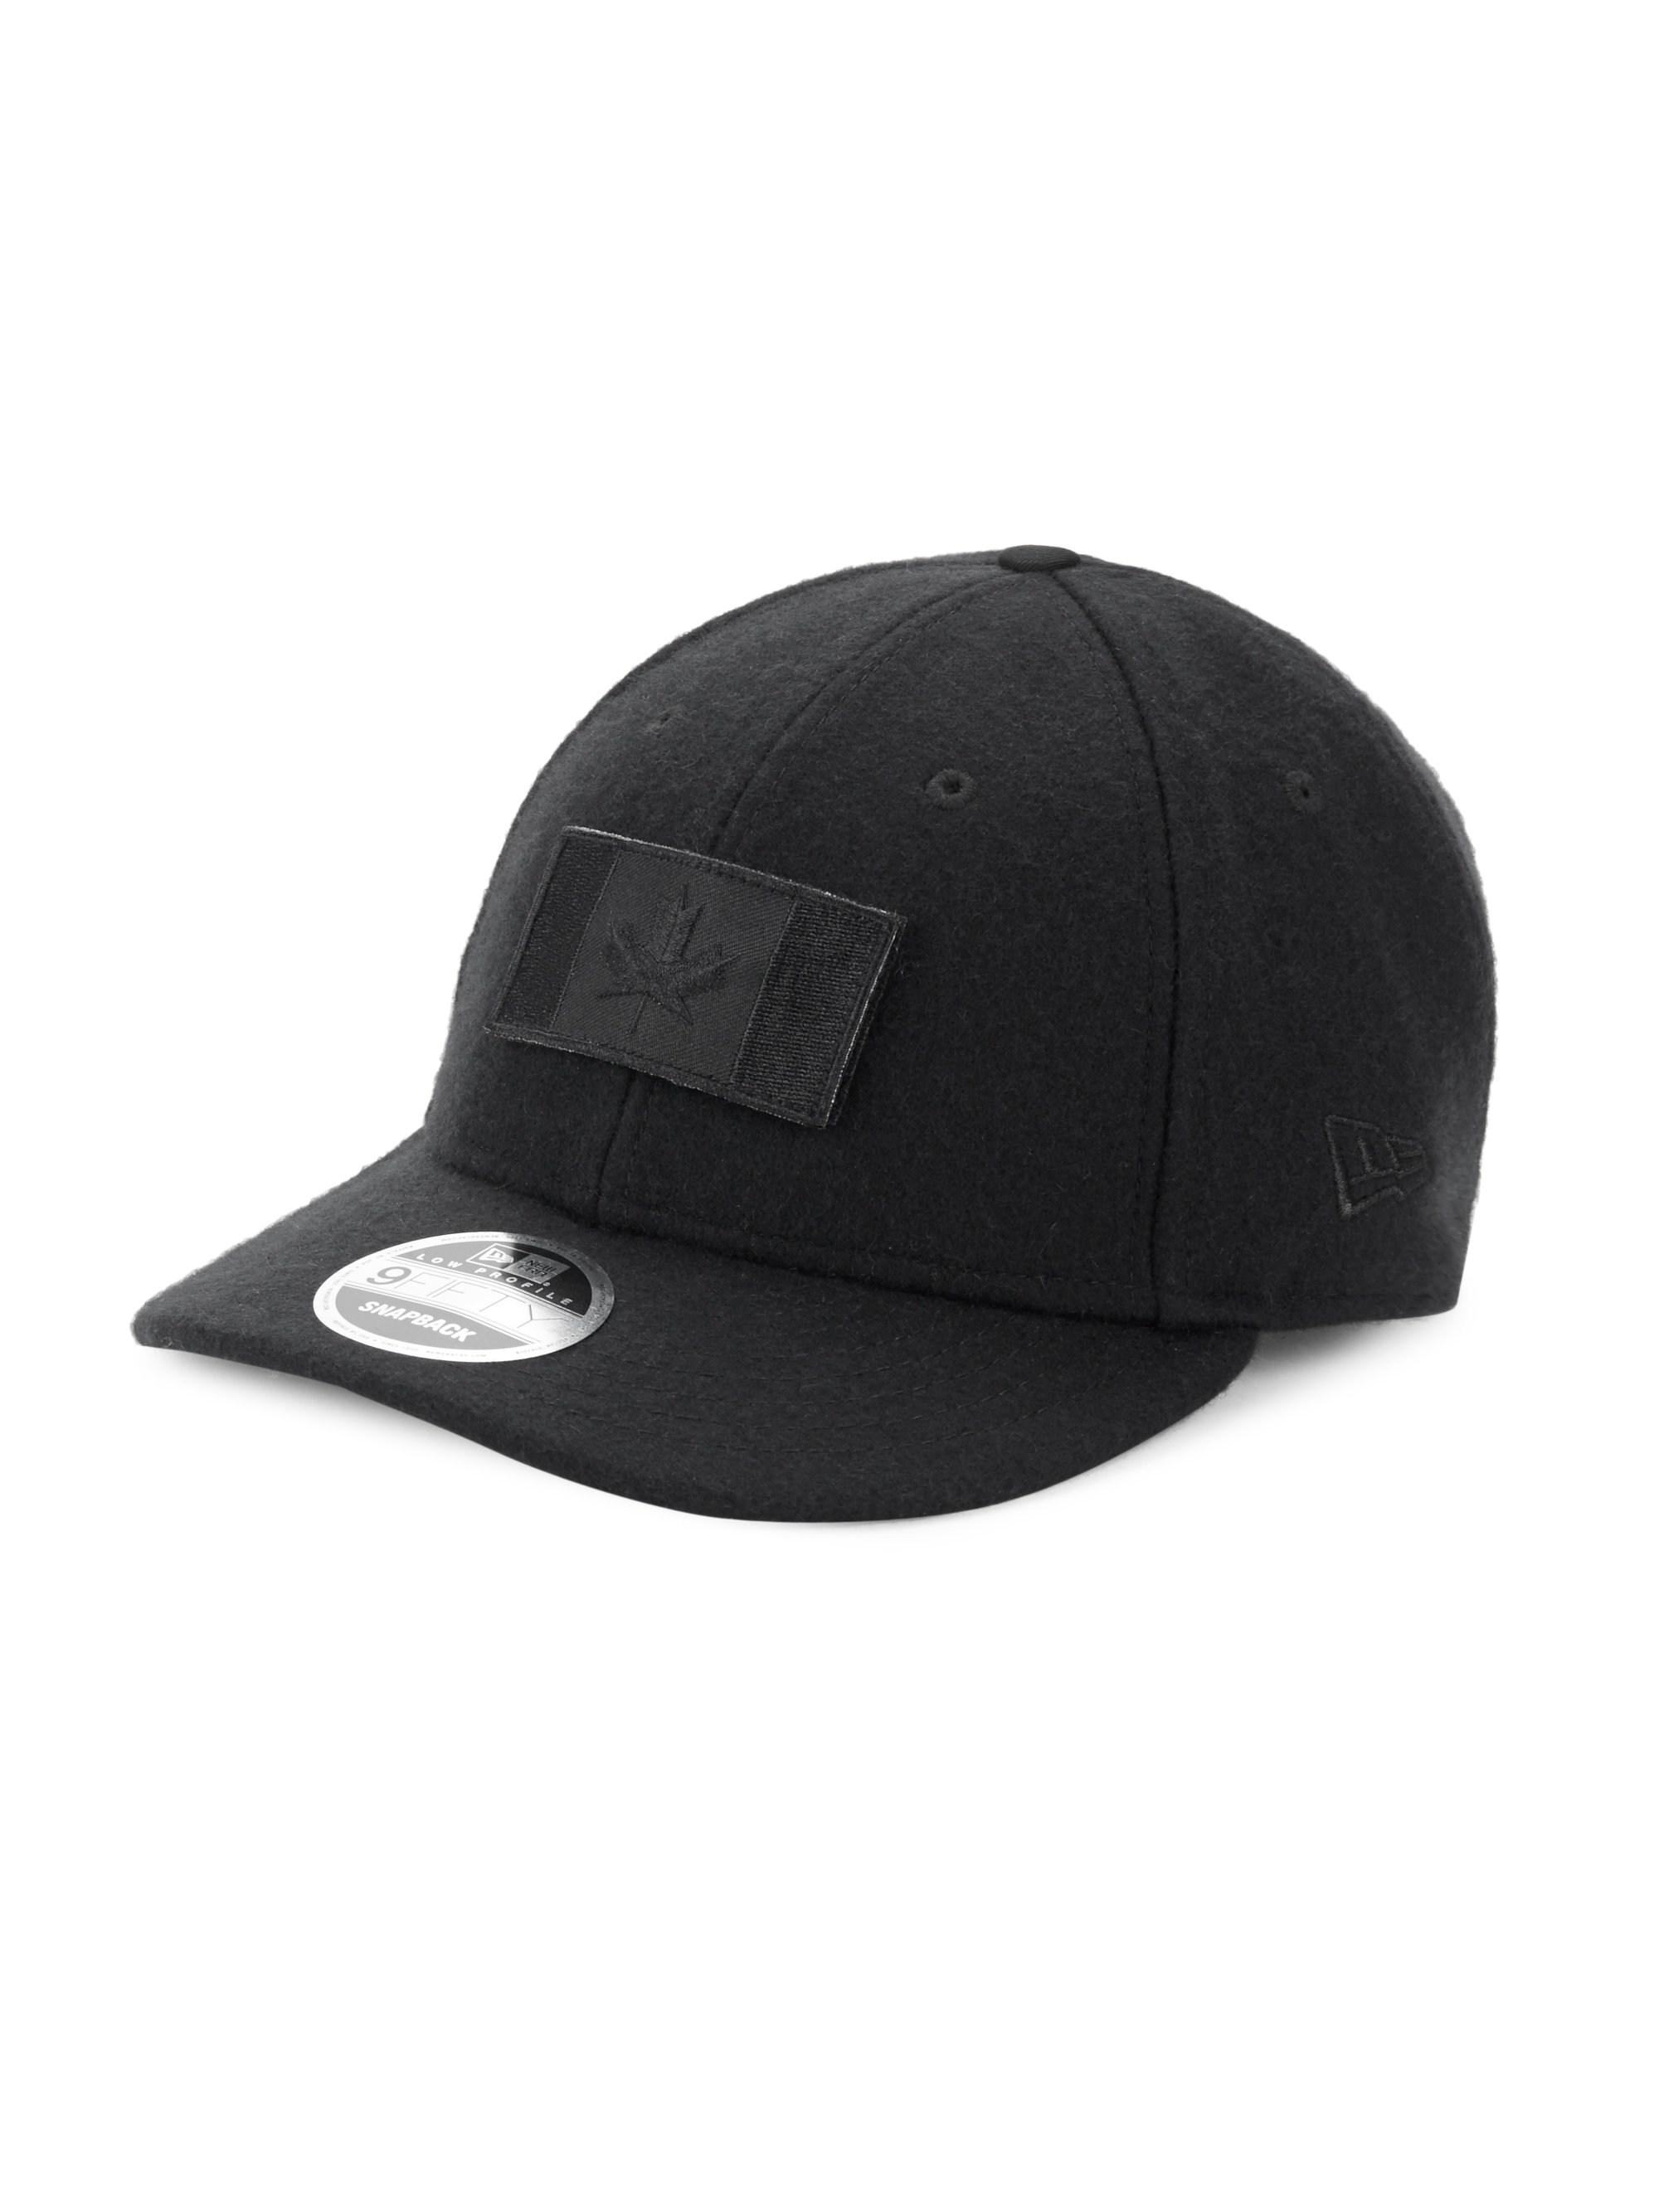 a2d6f567ddc Lyst - Canada Goose Melton Wool Baseball Hat in Black for Men